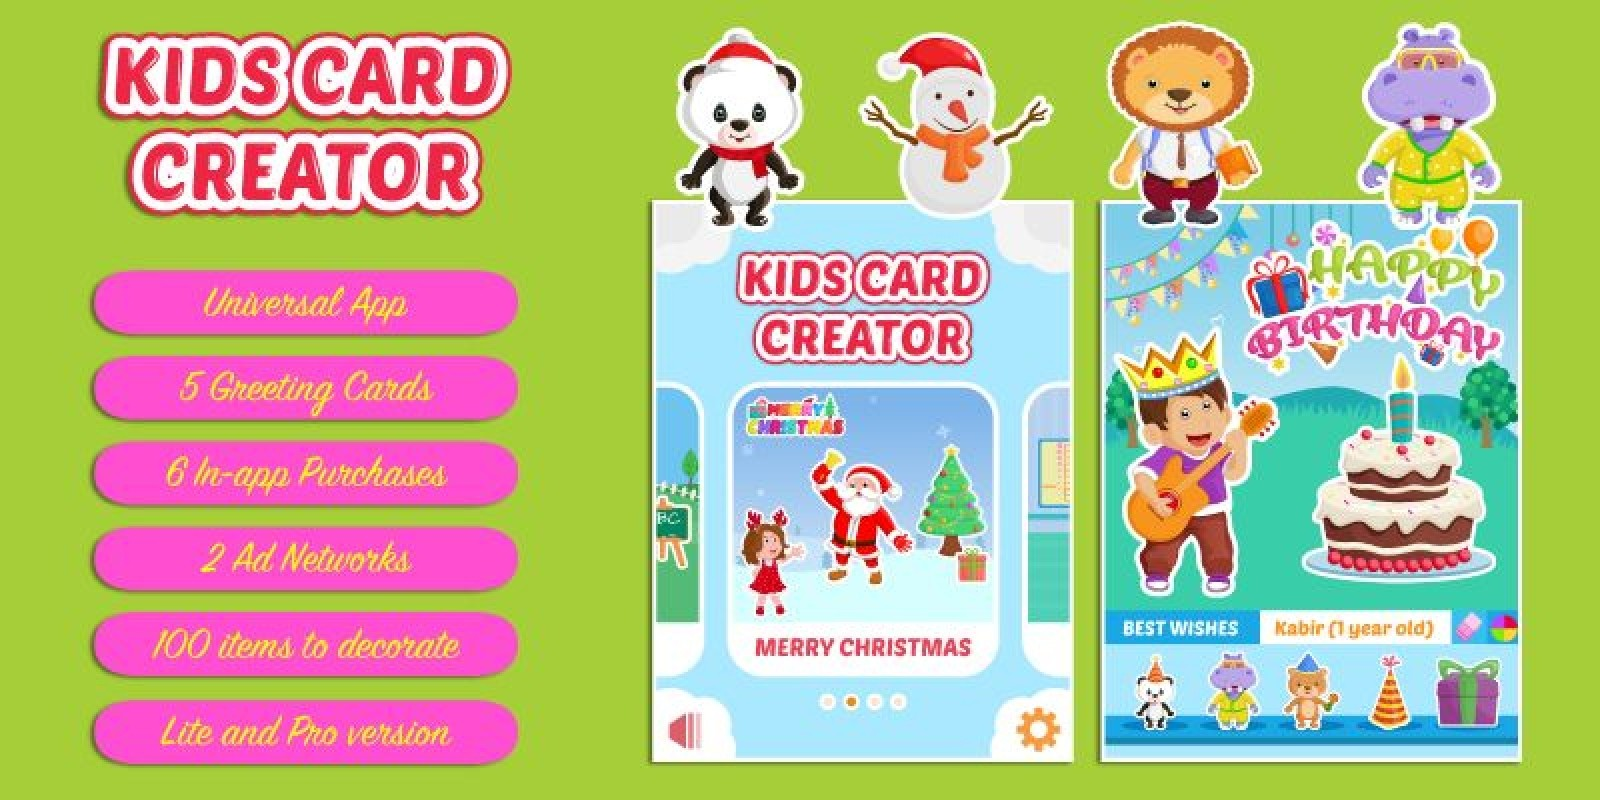 Kids Card Creator - iOS App Source Code